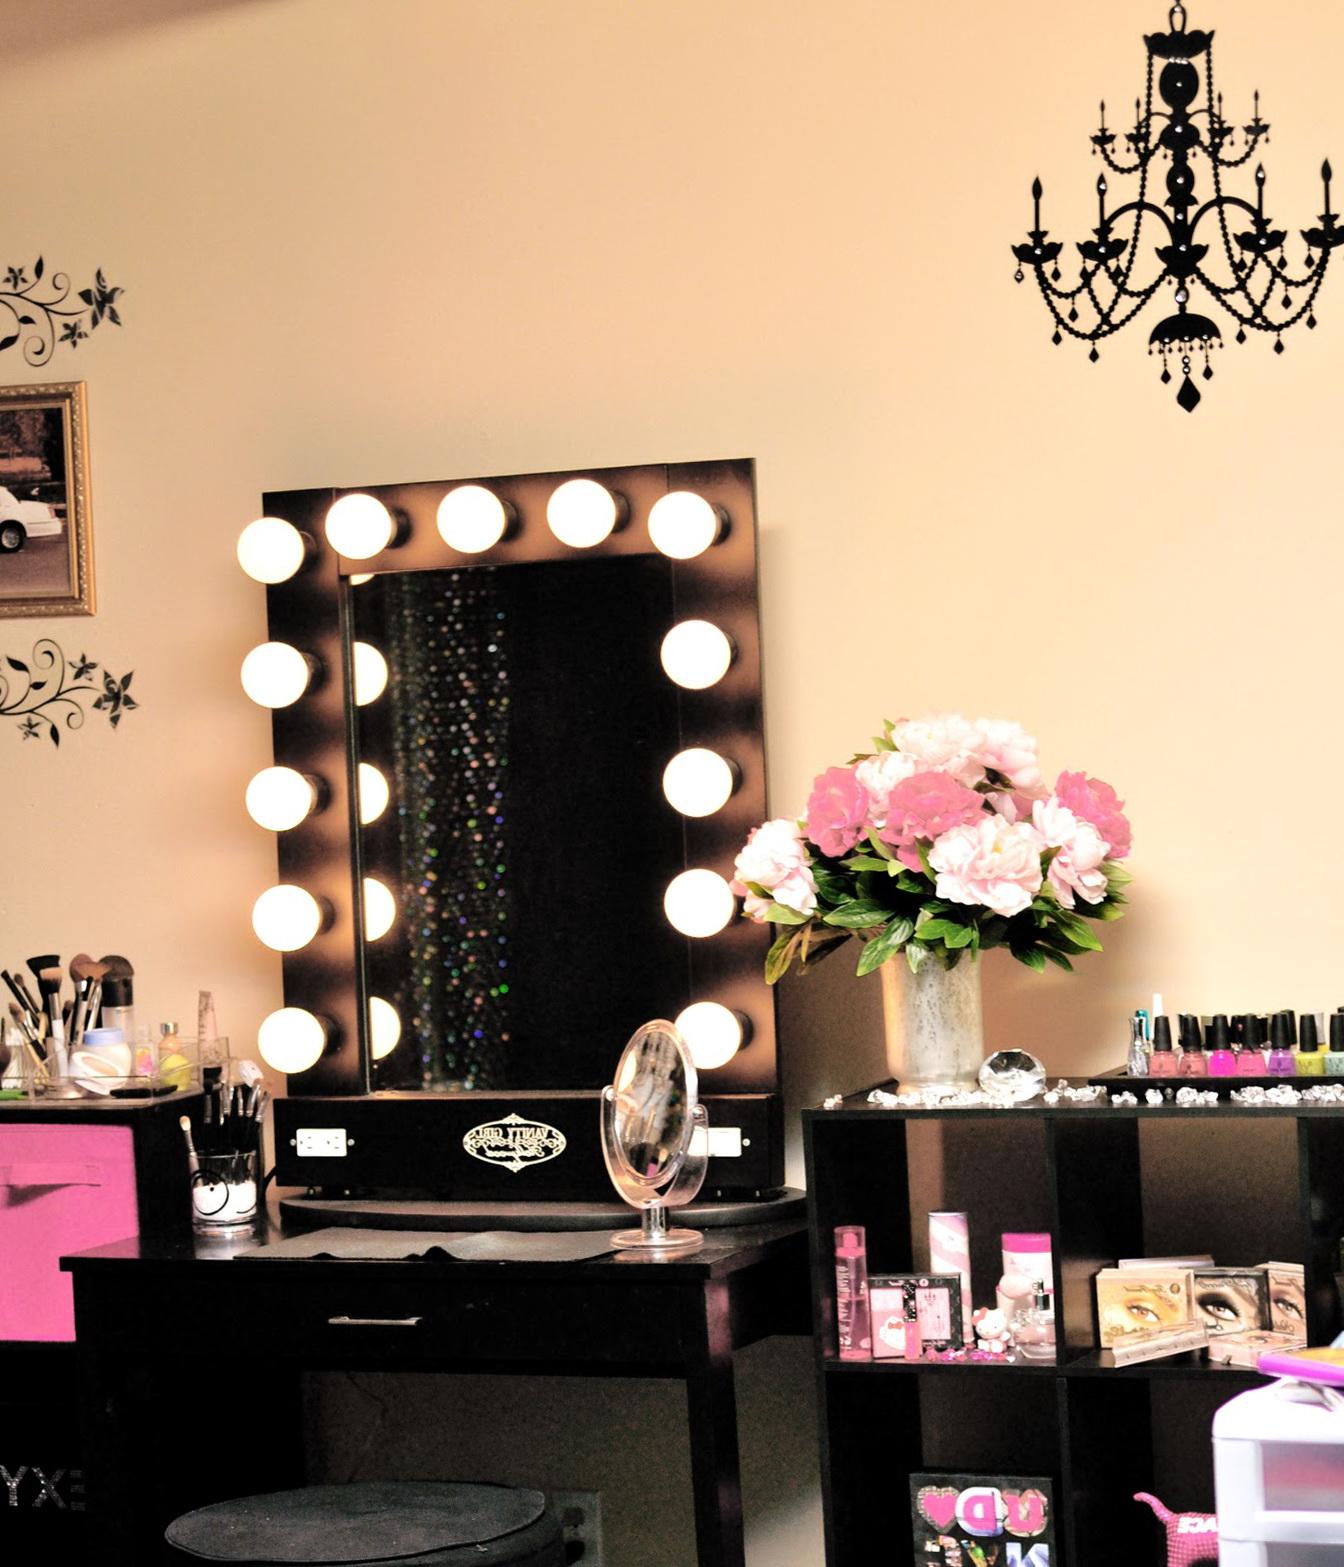 Makeup Vanity Mirror With Light Bulbs